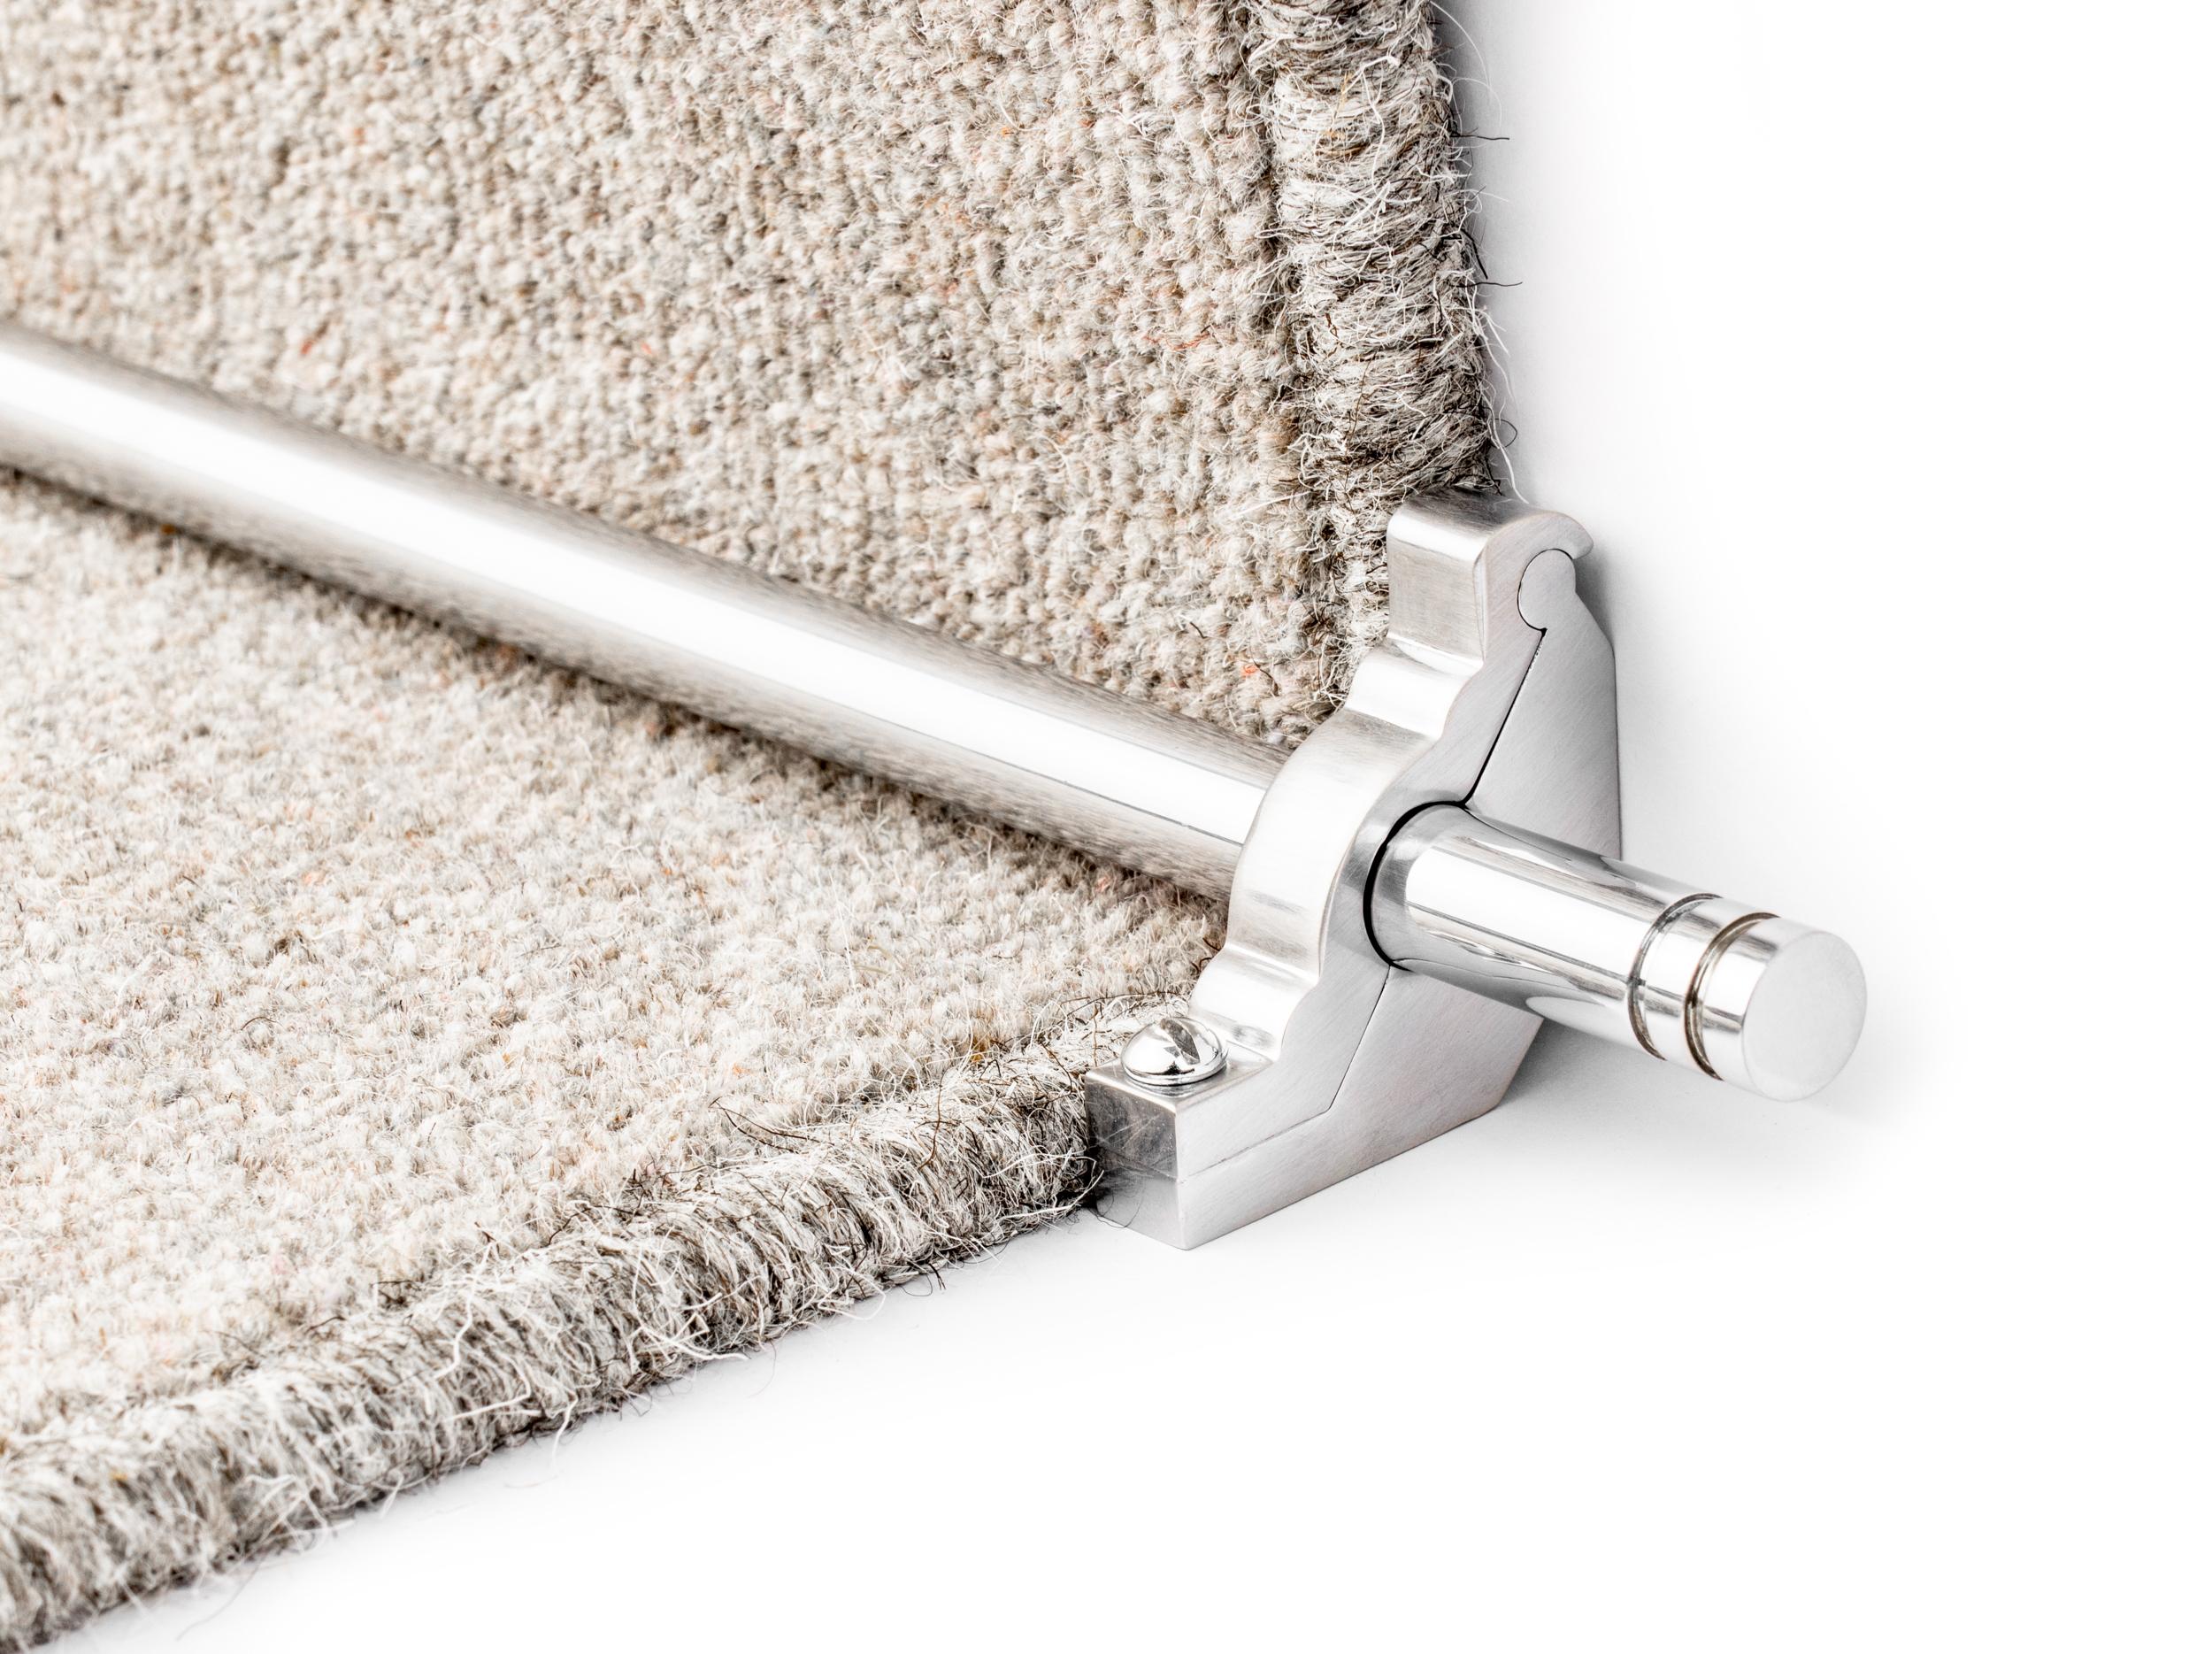 stairrods-brushed-chrome-premier-woburn 1.jpg